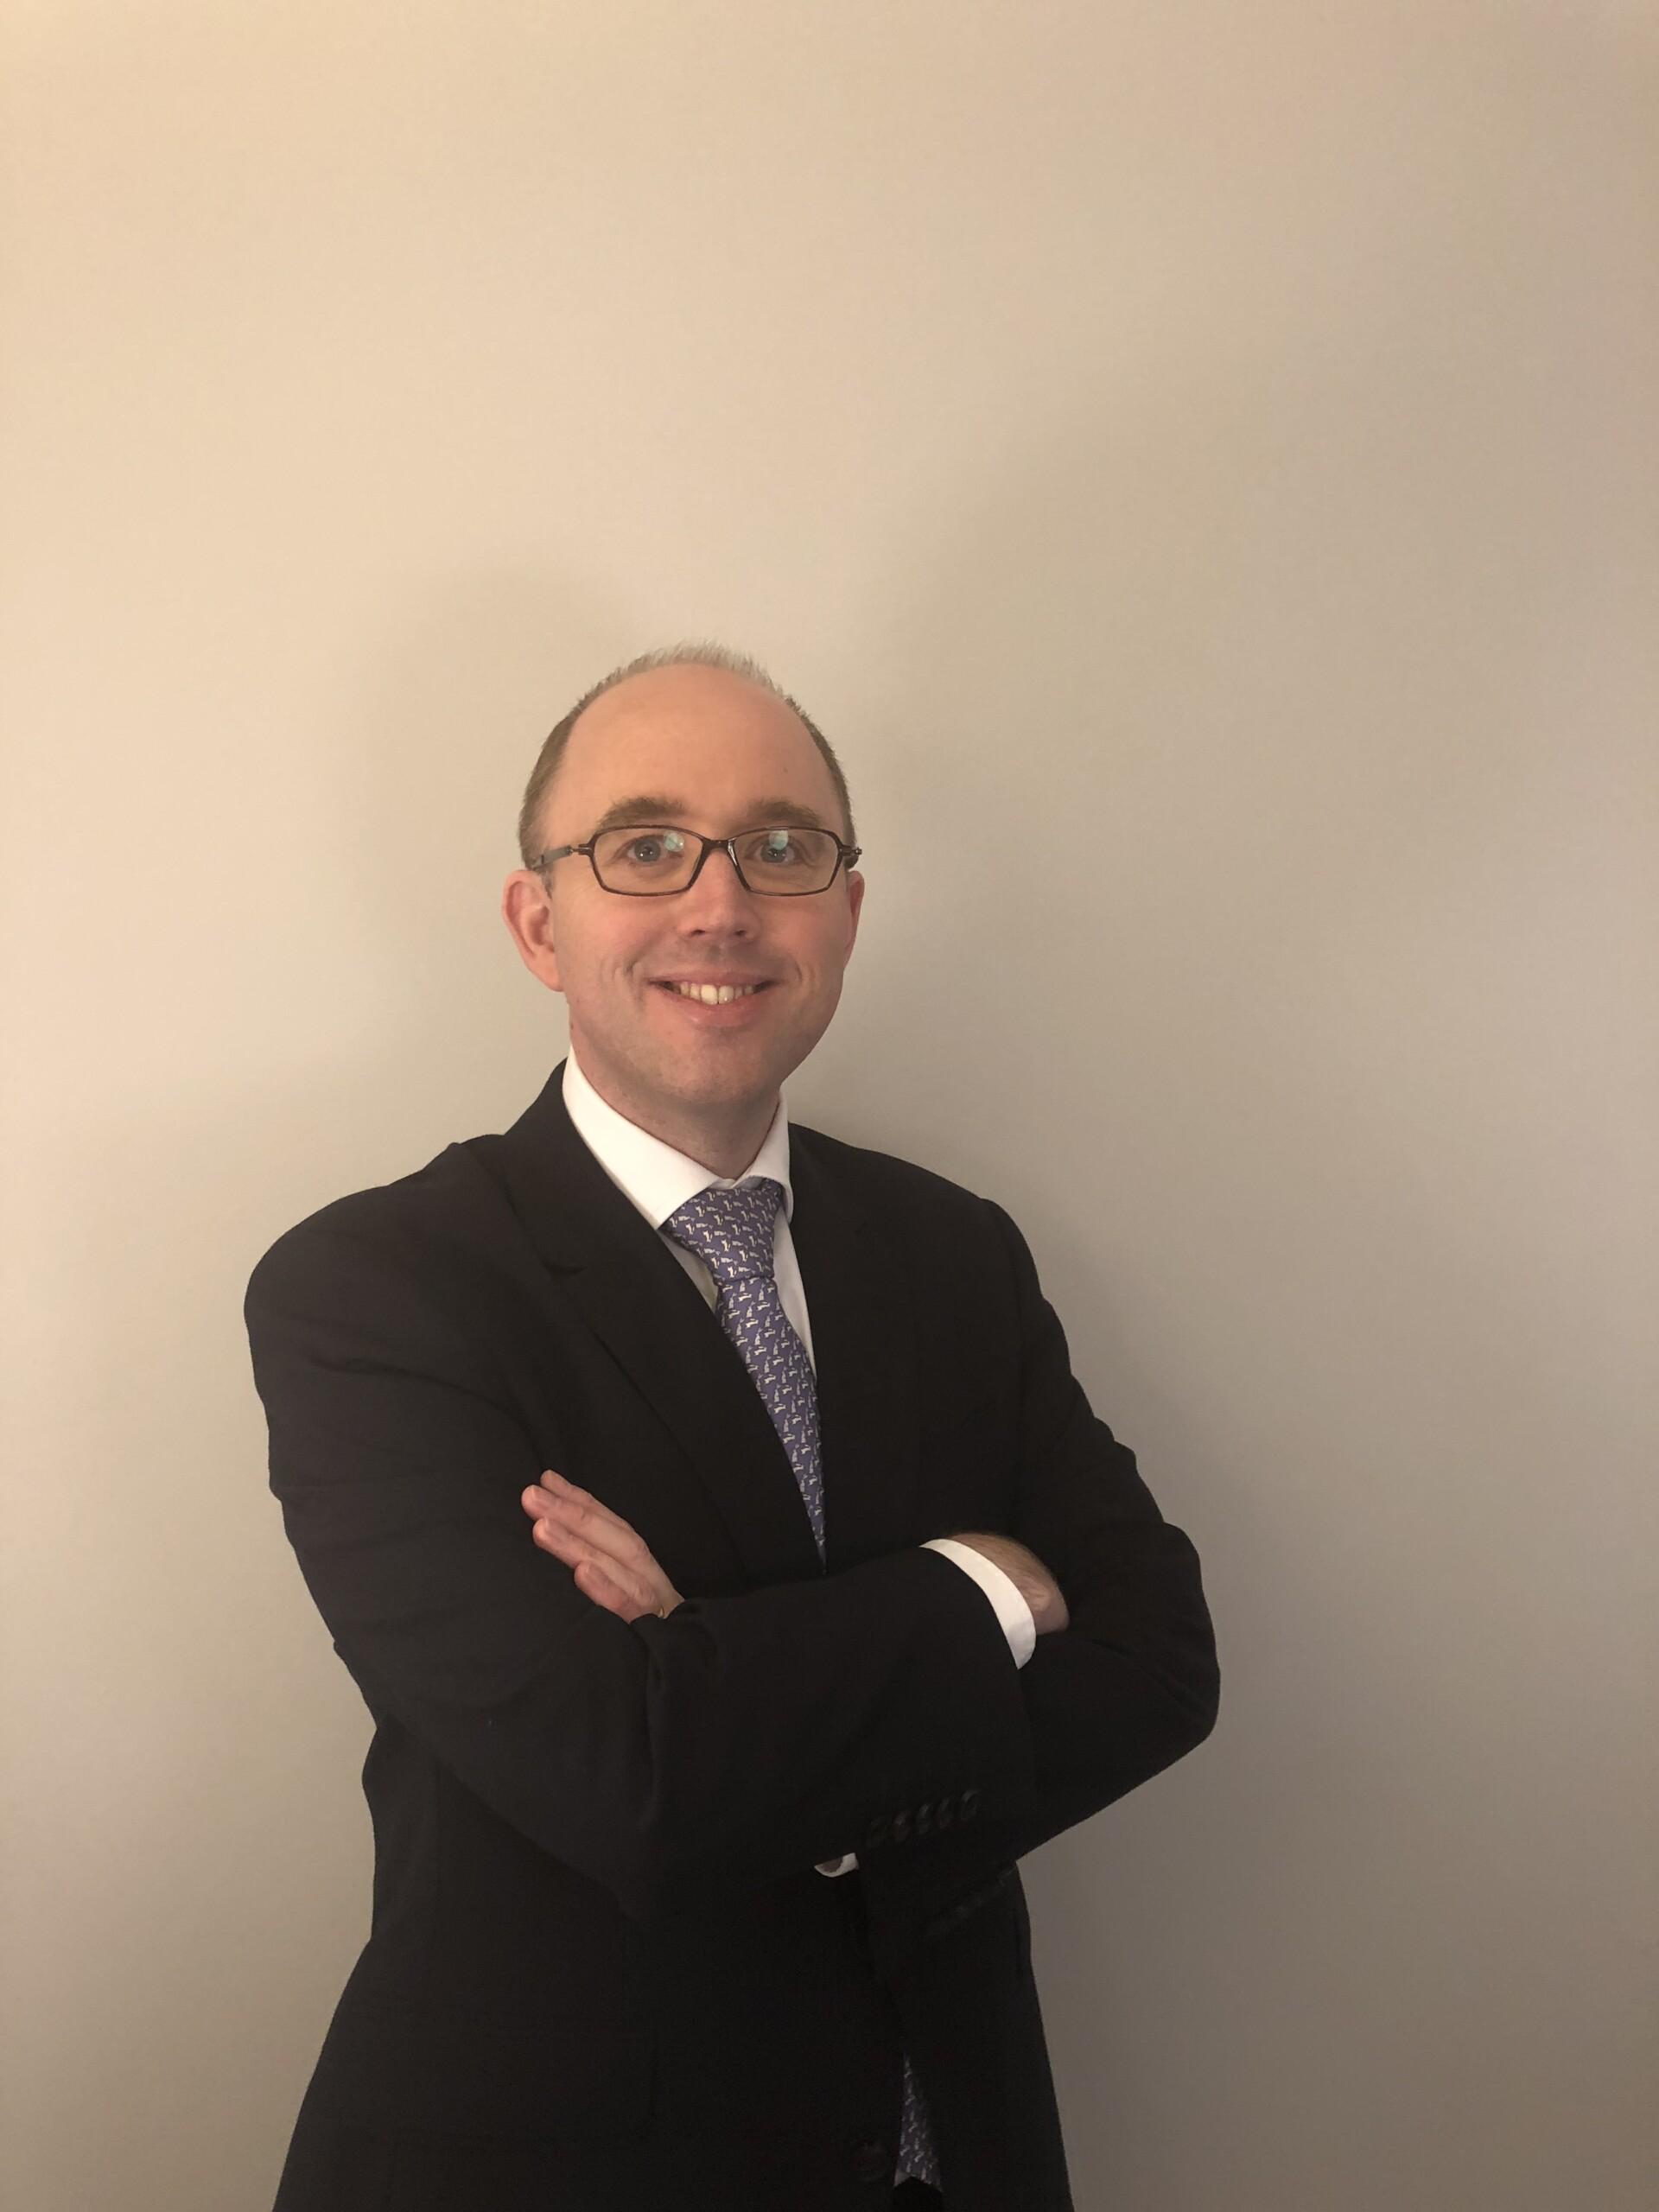 Dr Matthew Knight MBE